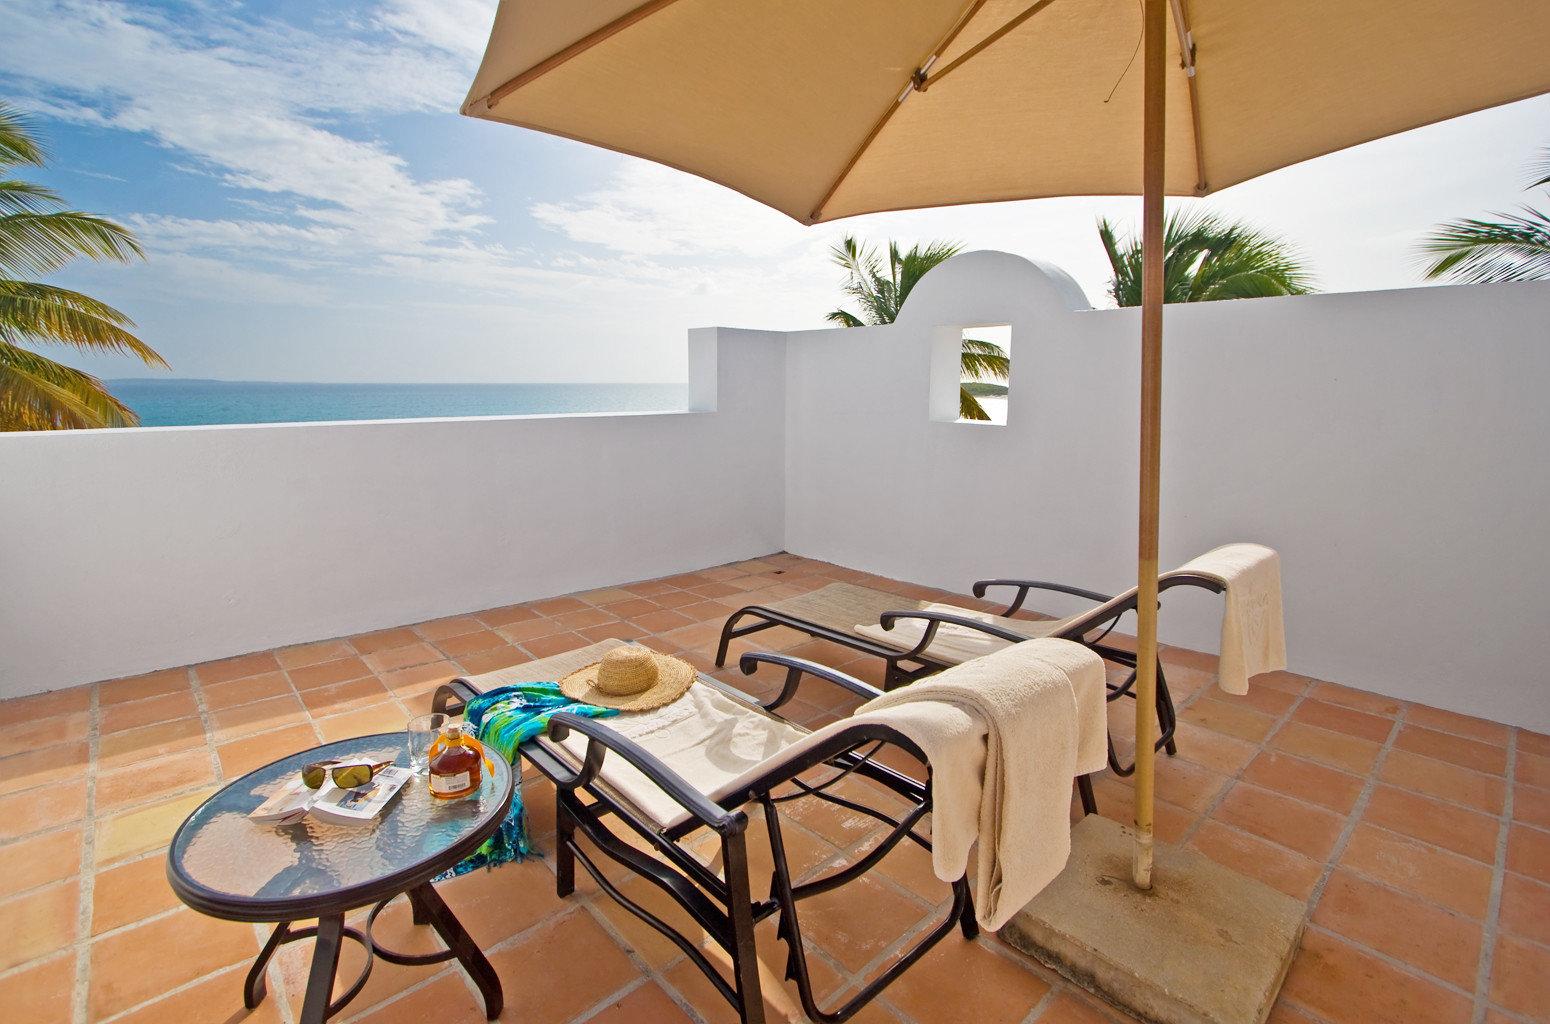 Beach Beachfront Lounge Ocean chair property Villa house cottage home Resort condominium farmhouse hacienda